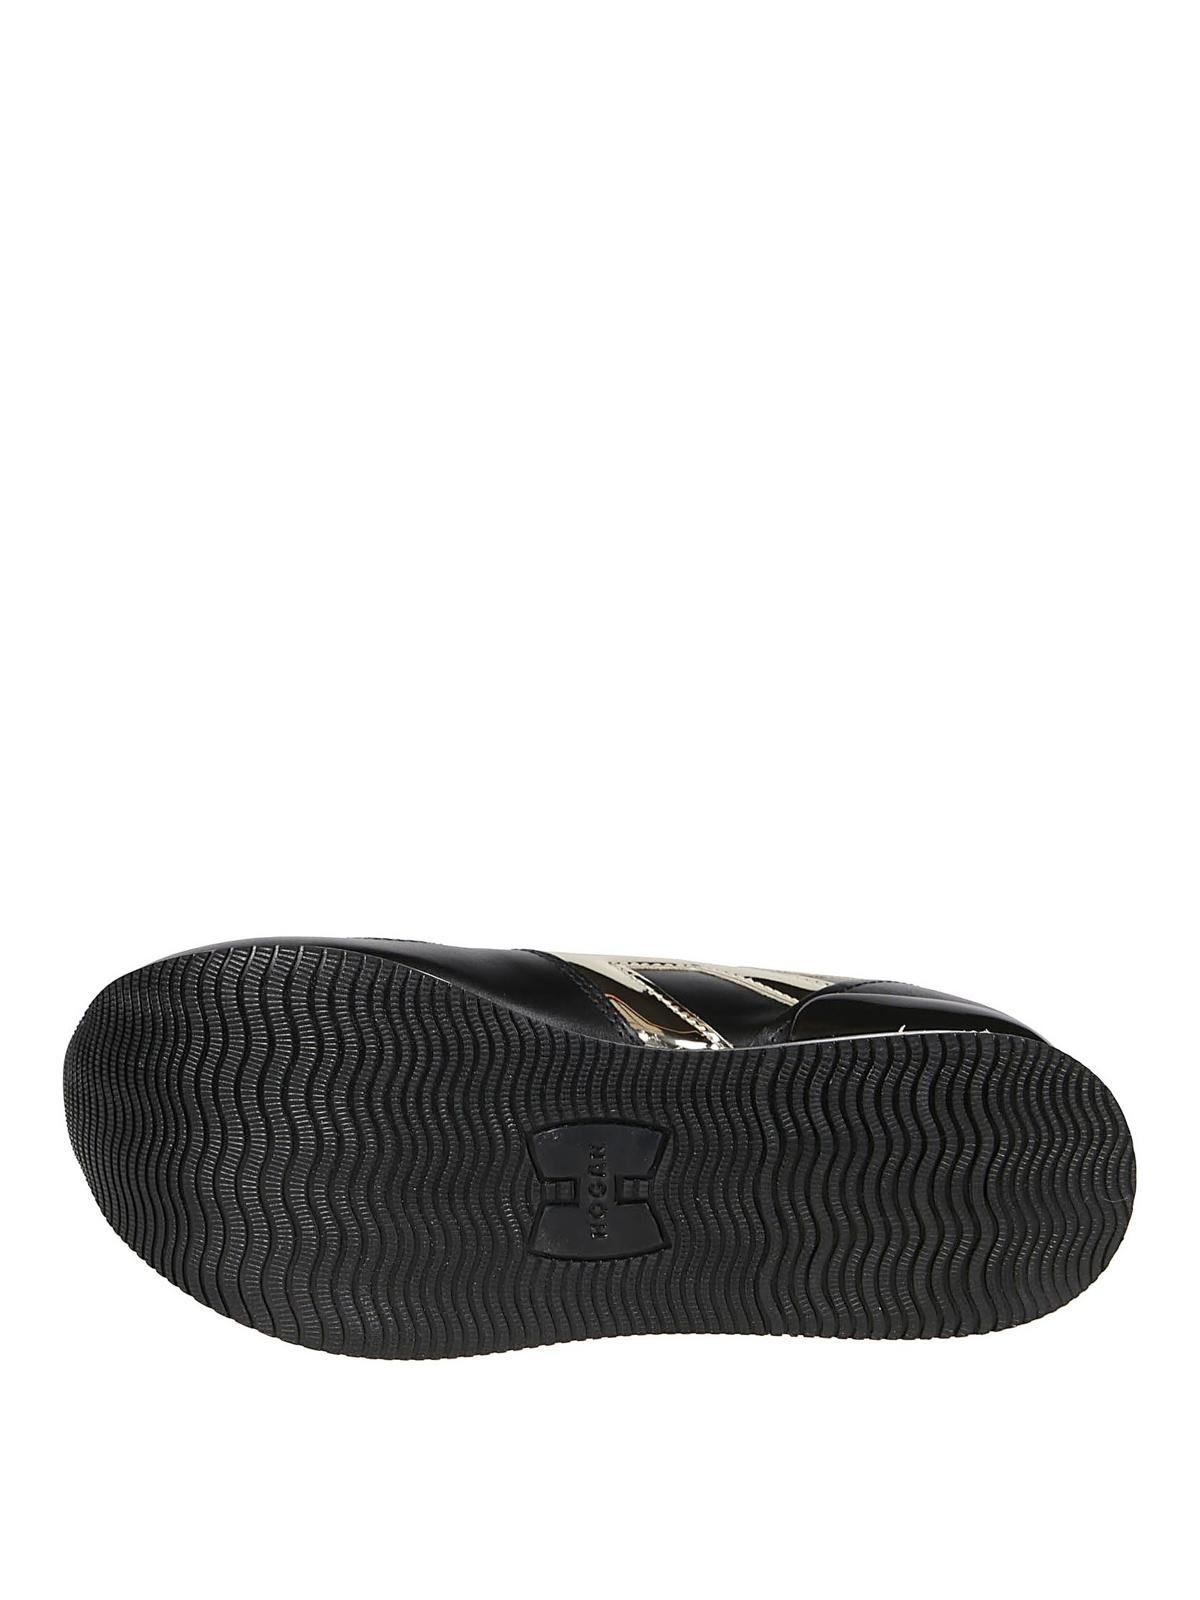 Sneakers Hogan - Sneaker nere e oro Maxi H222 - HXW2830T548LKQ547D